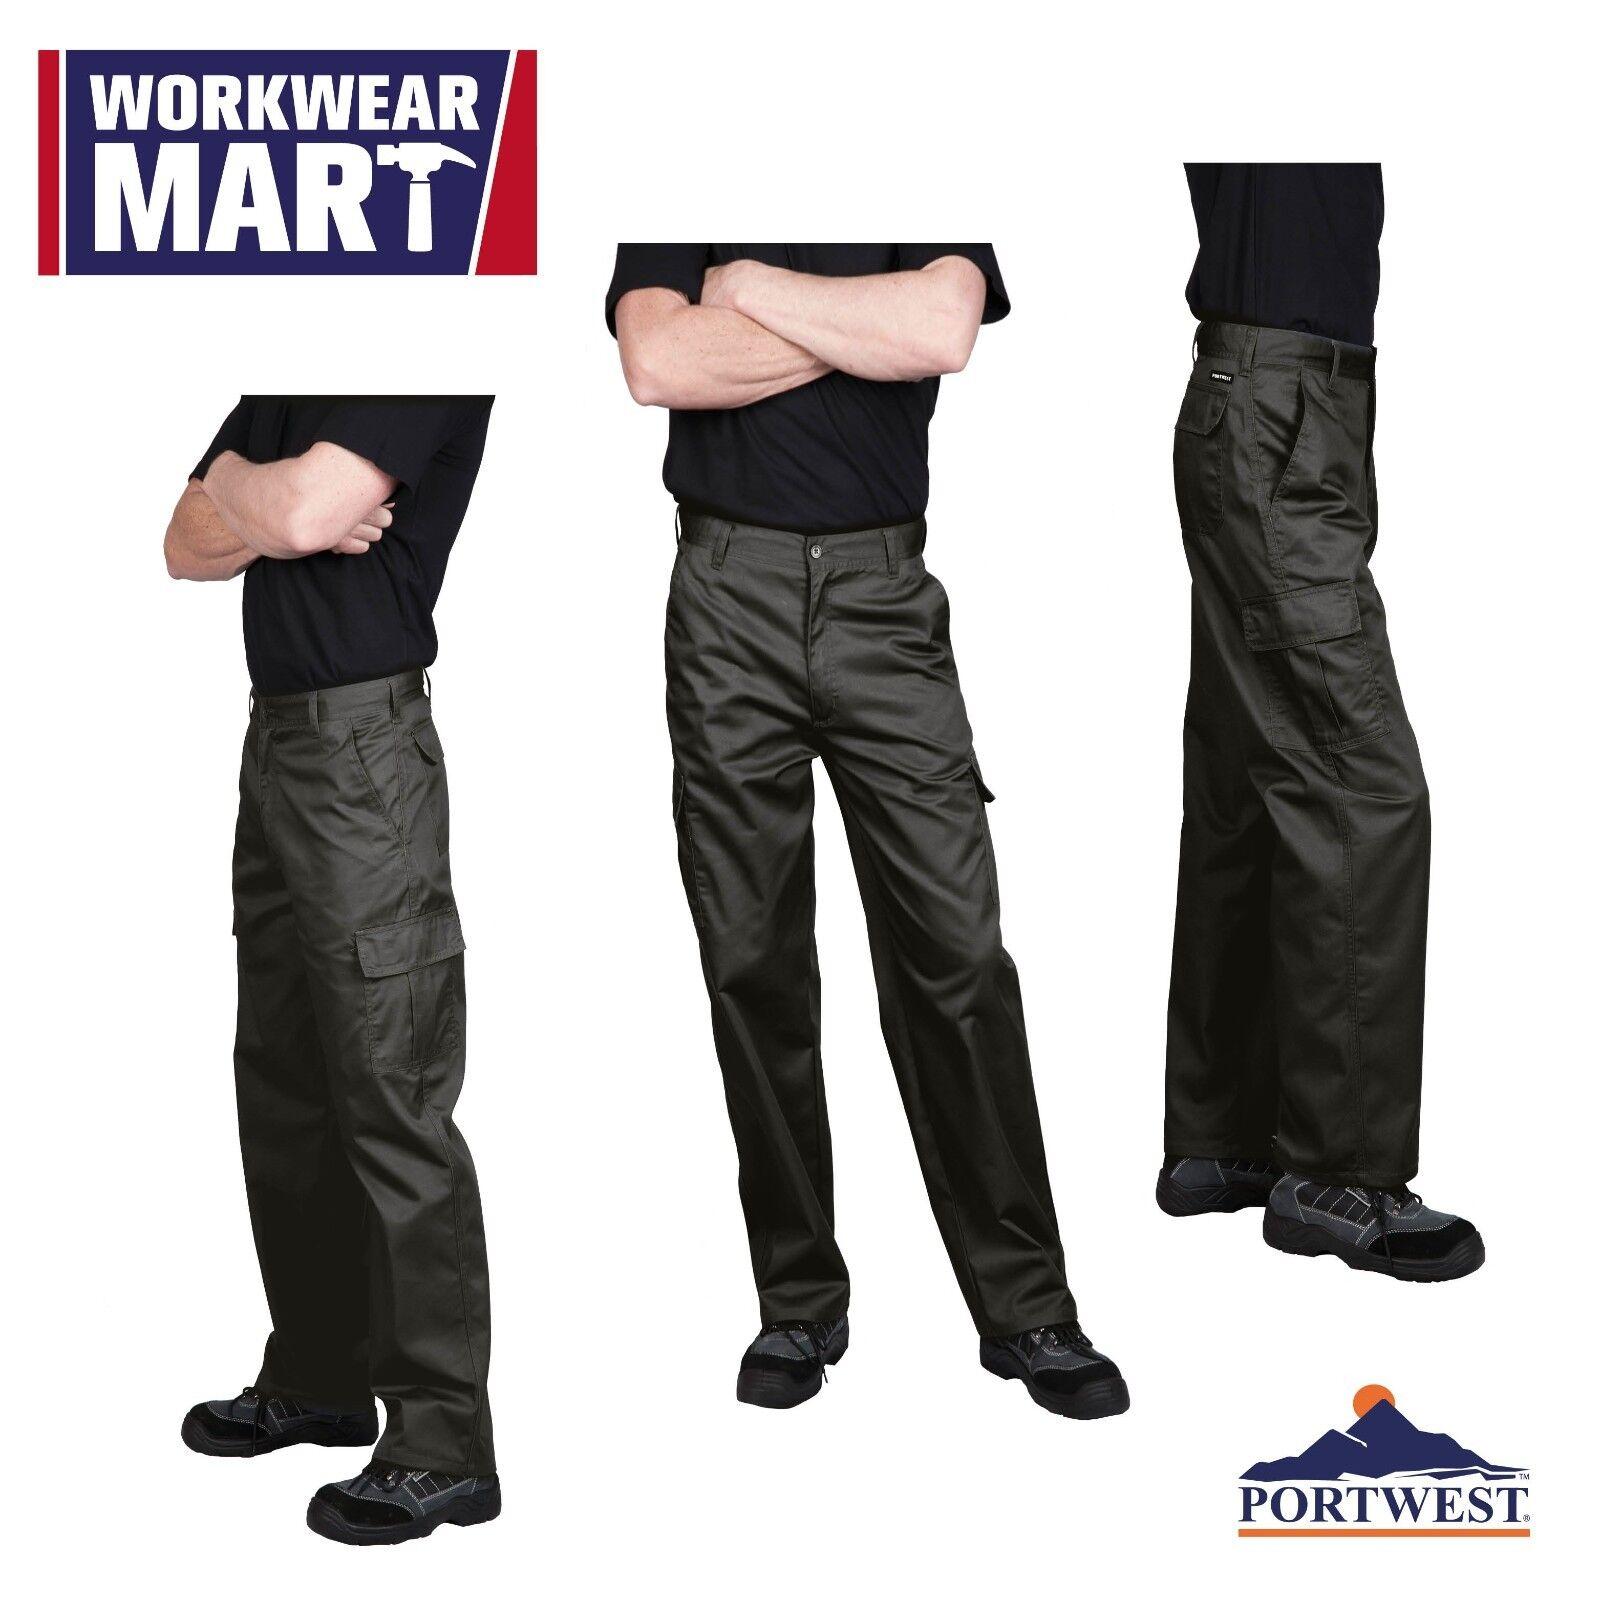 Portwest C701 Cargo Work Pants for Men, in Navy & Black: sizes 30-48